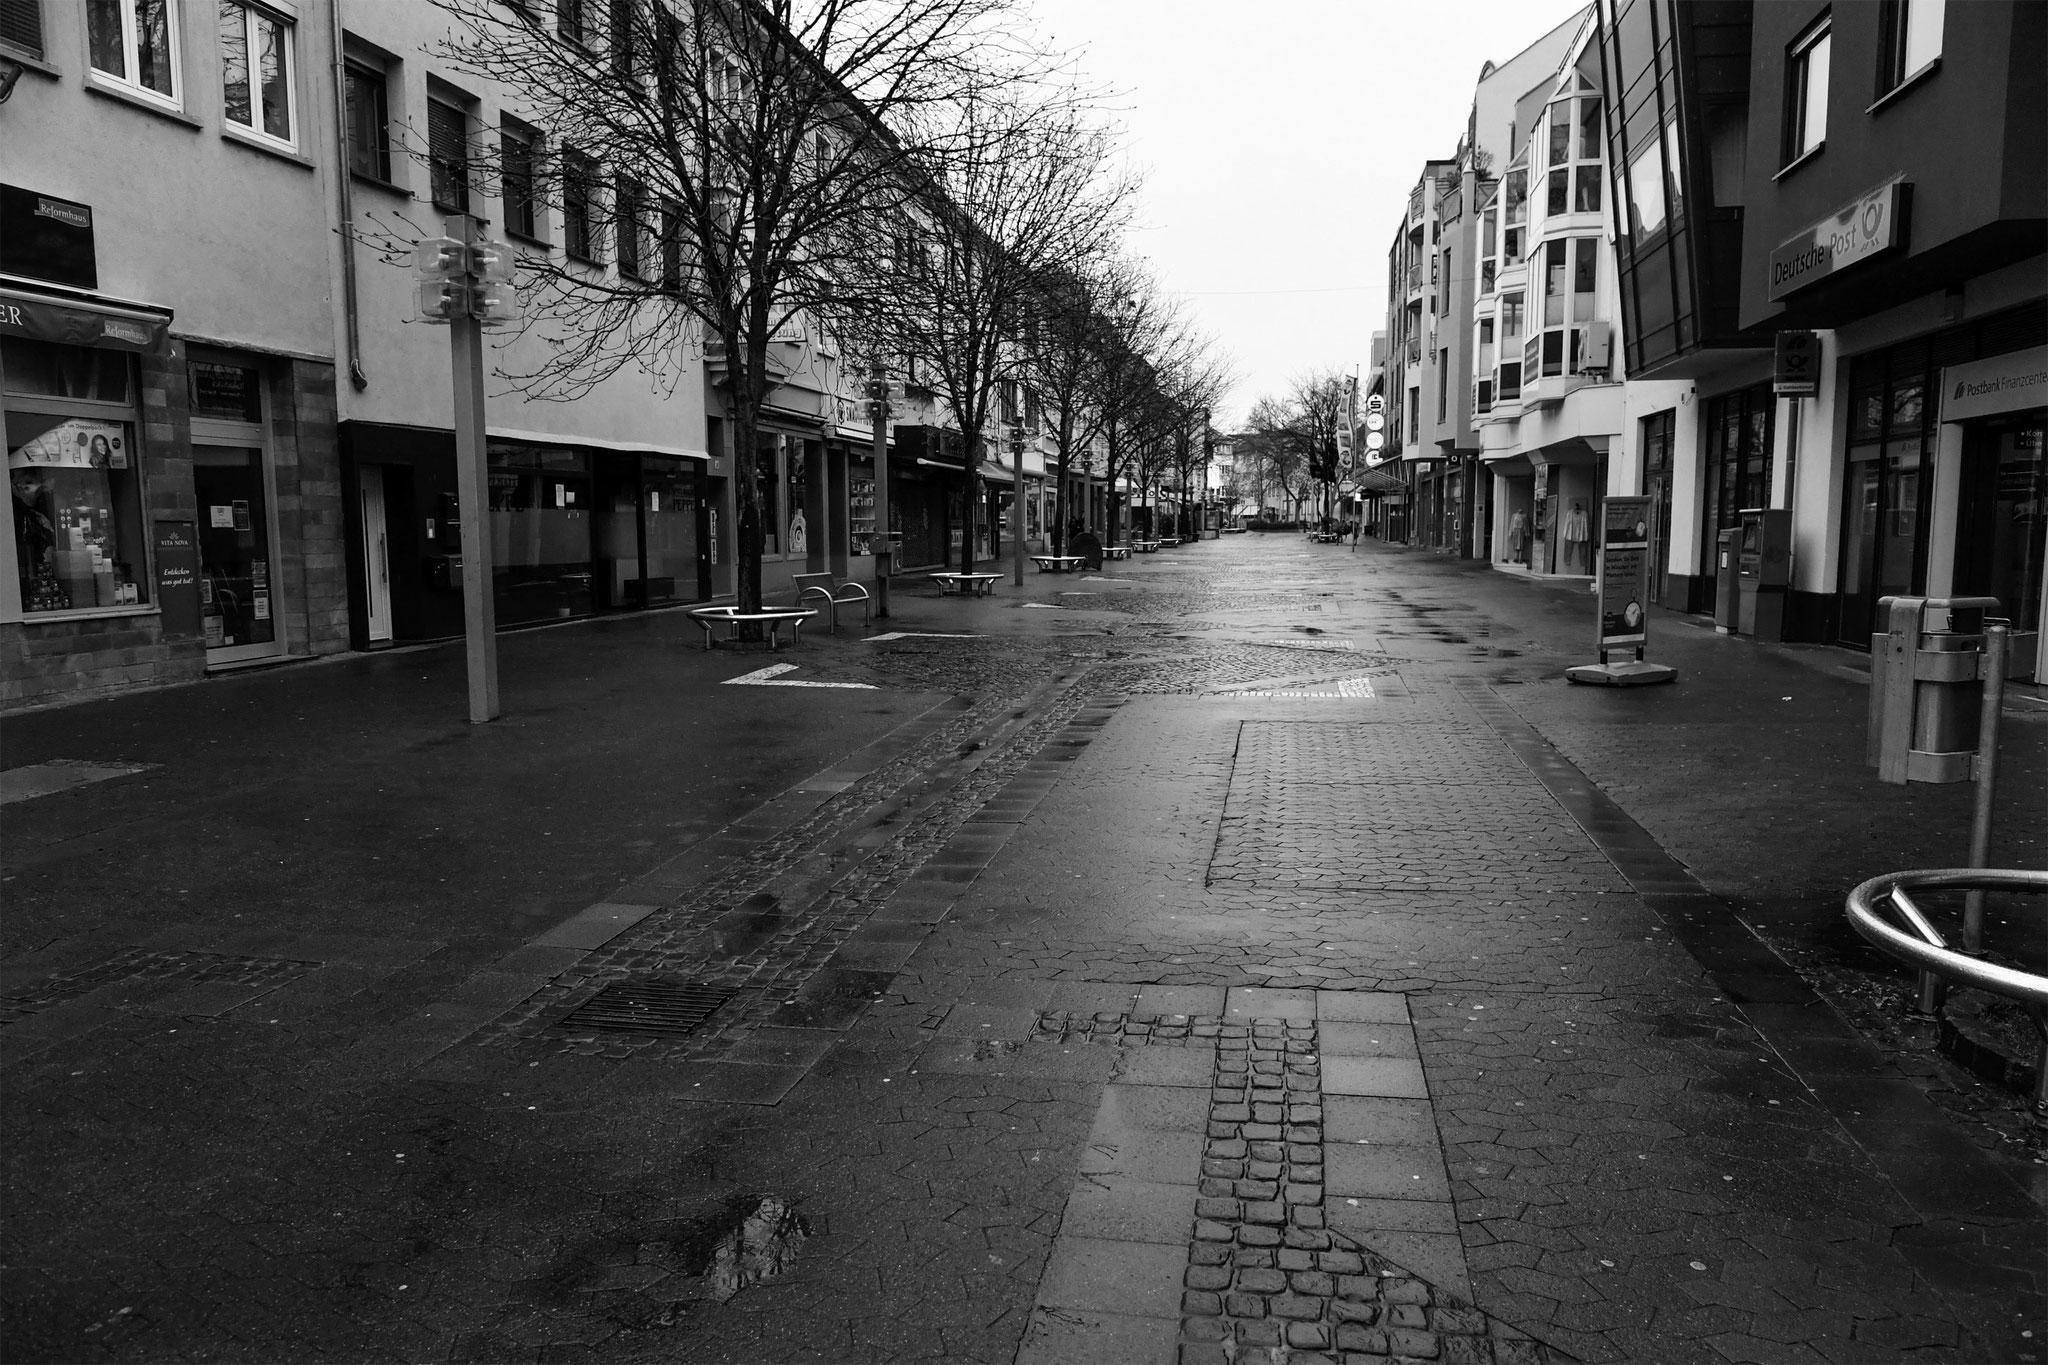 21.3.2020 | FT | Bahnhofstraße | leere Fußgängerzone (10.50 Uhr)